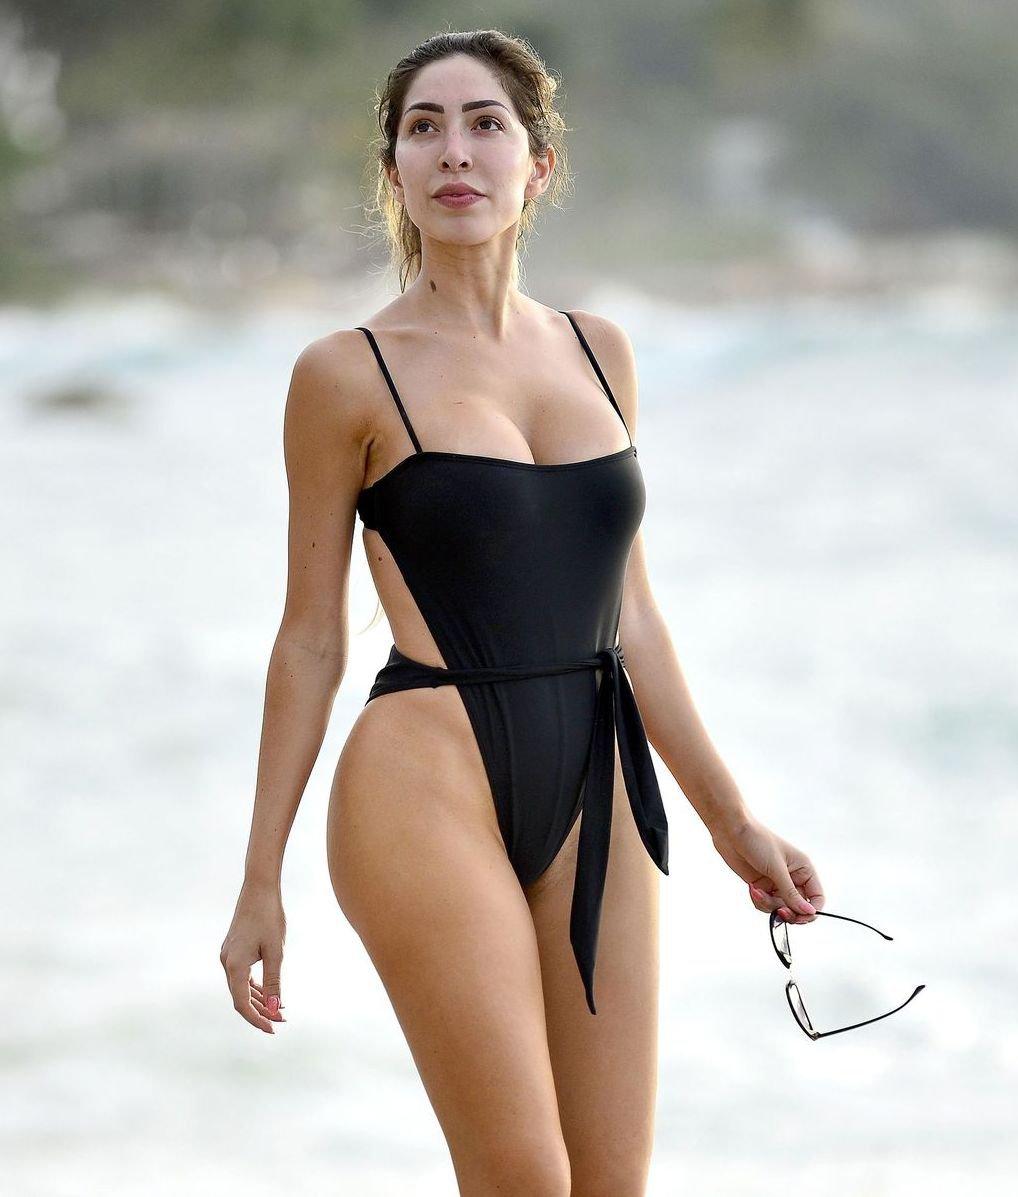 Farrah Abraham Sexy Body In Black Swimsuit